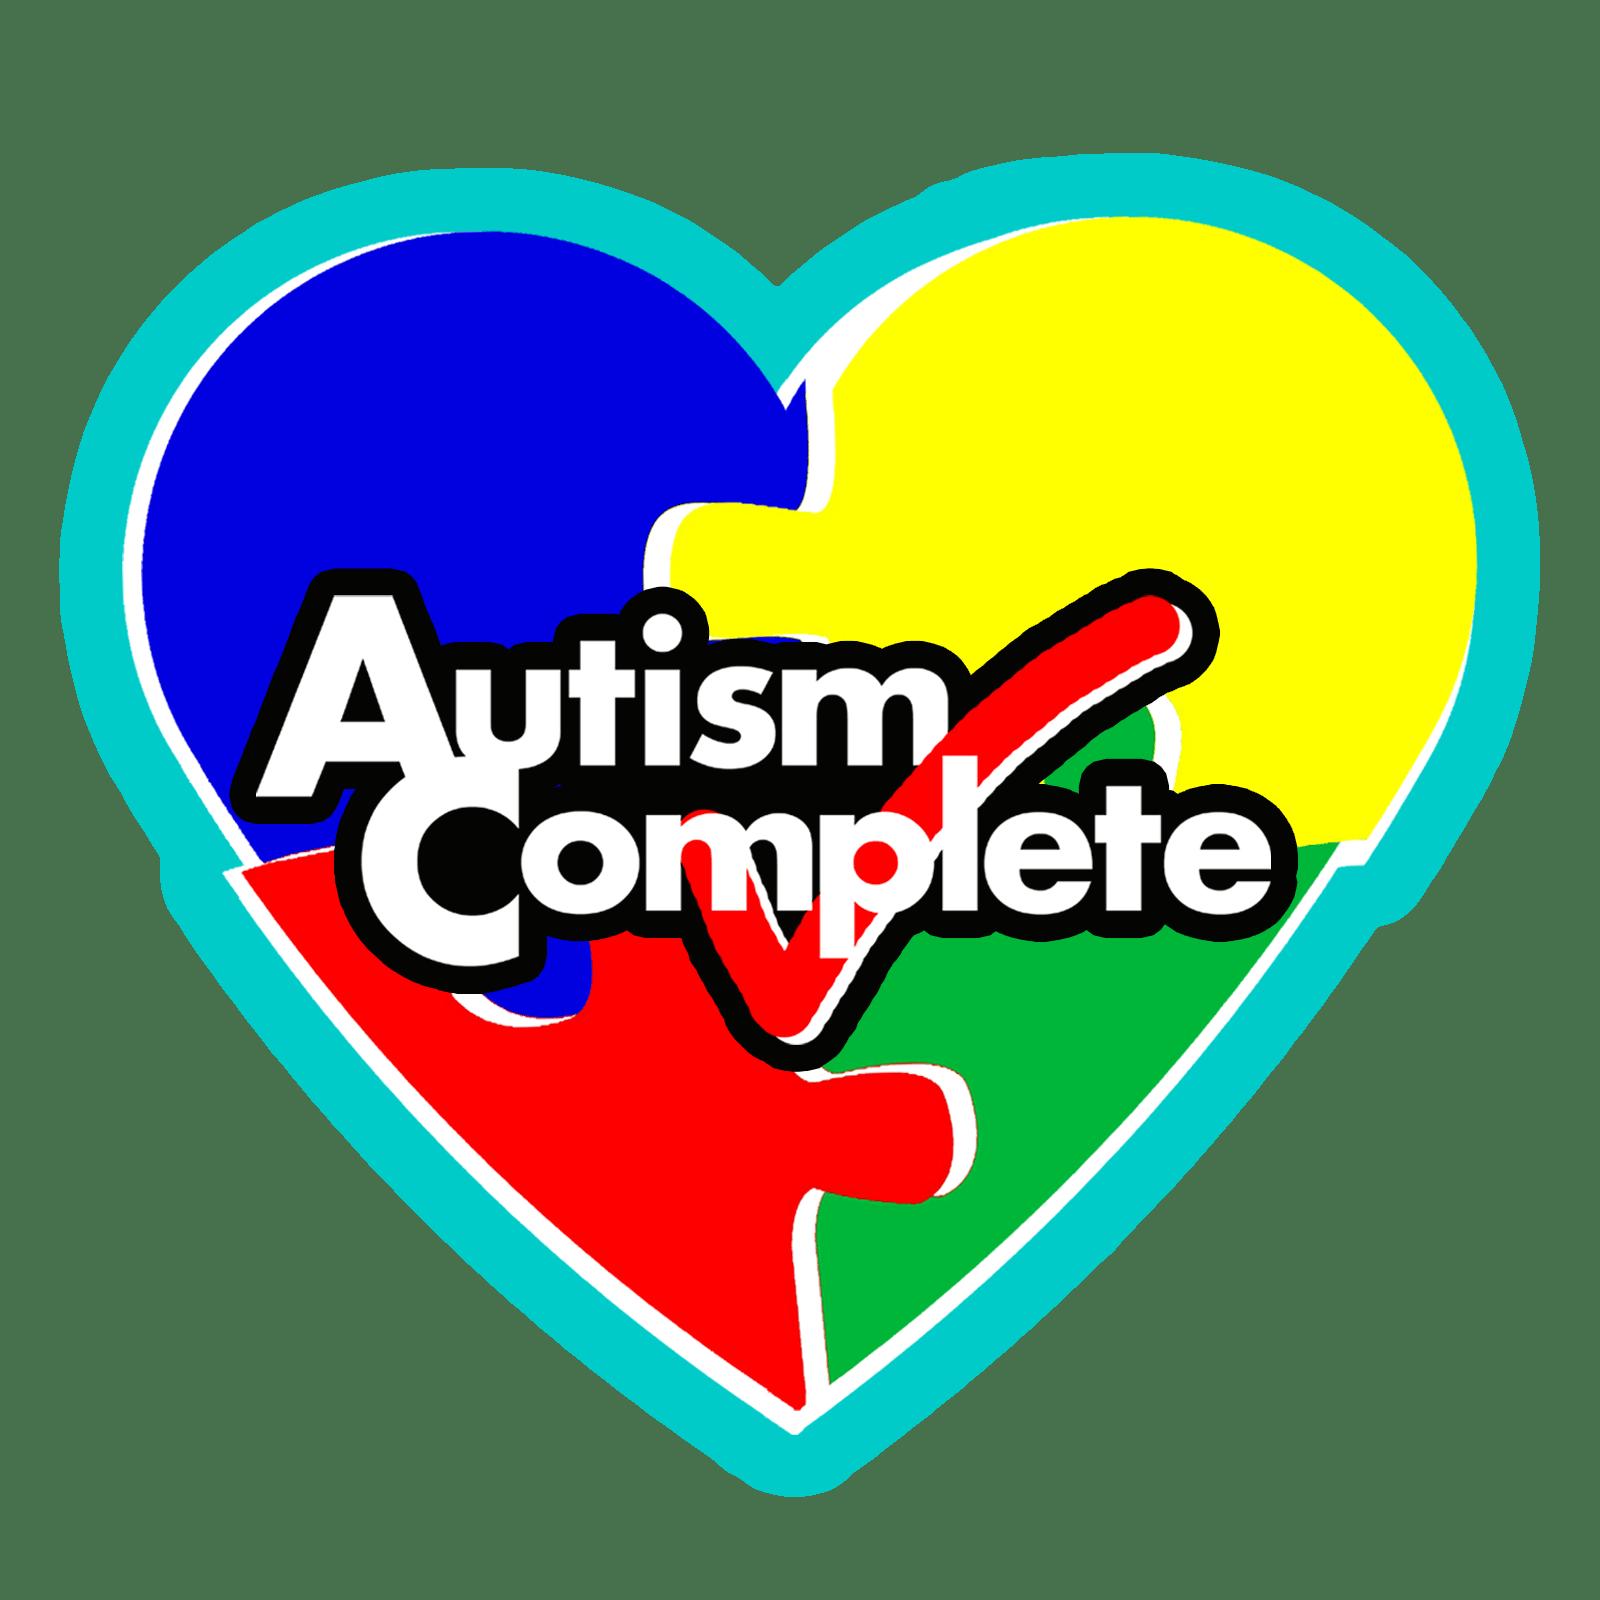 Autism Complete Teacher Resources